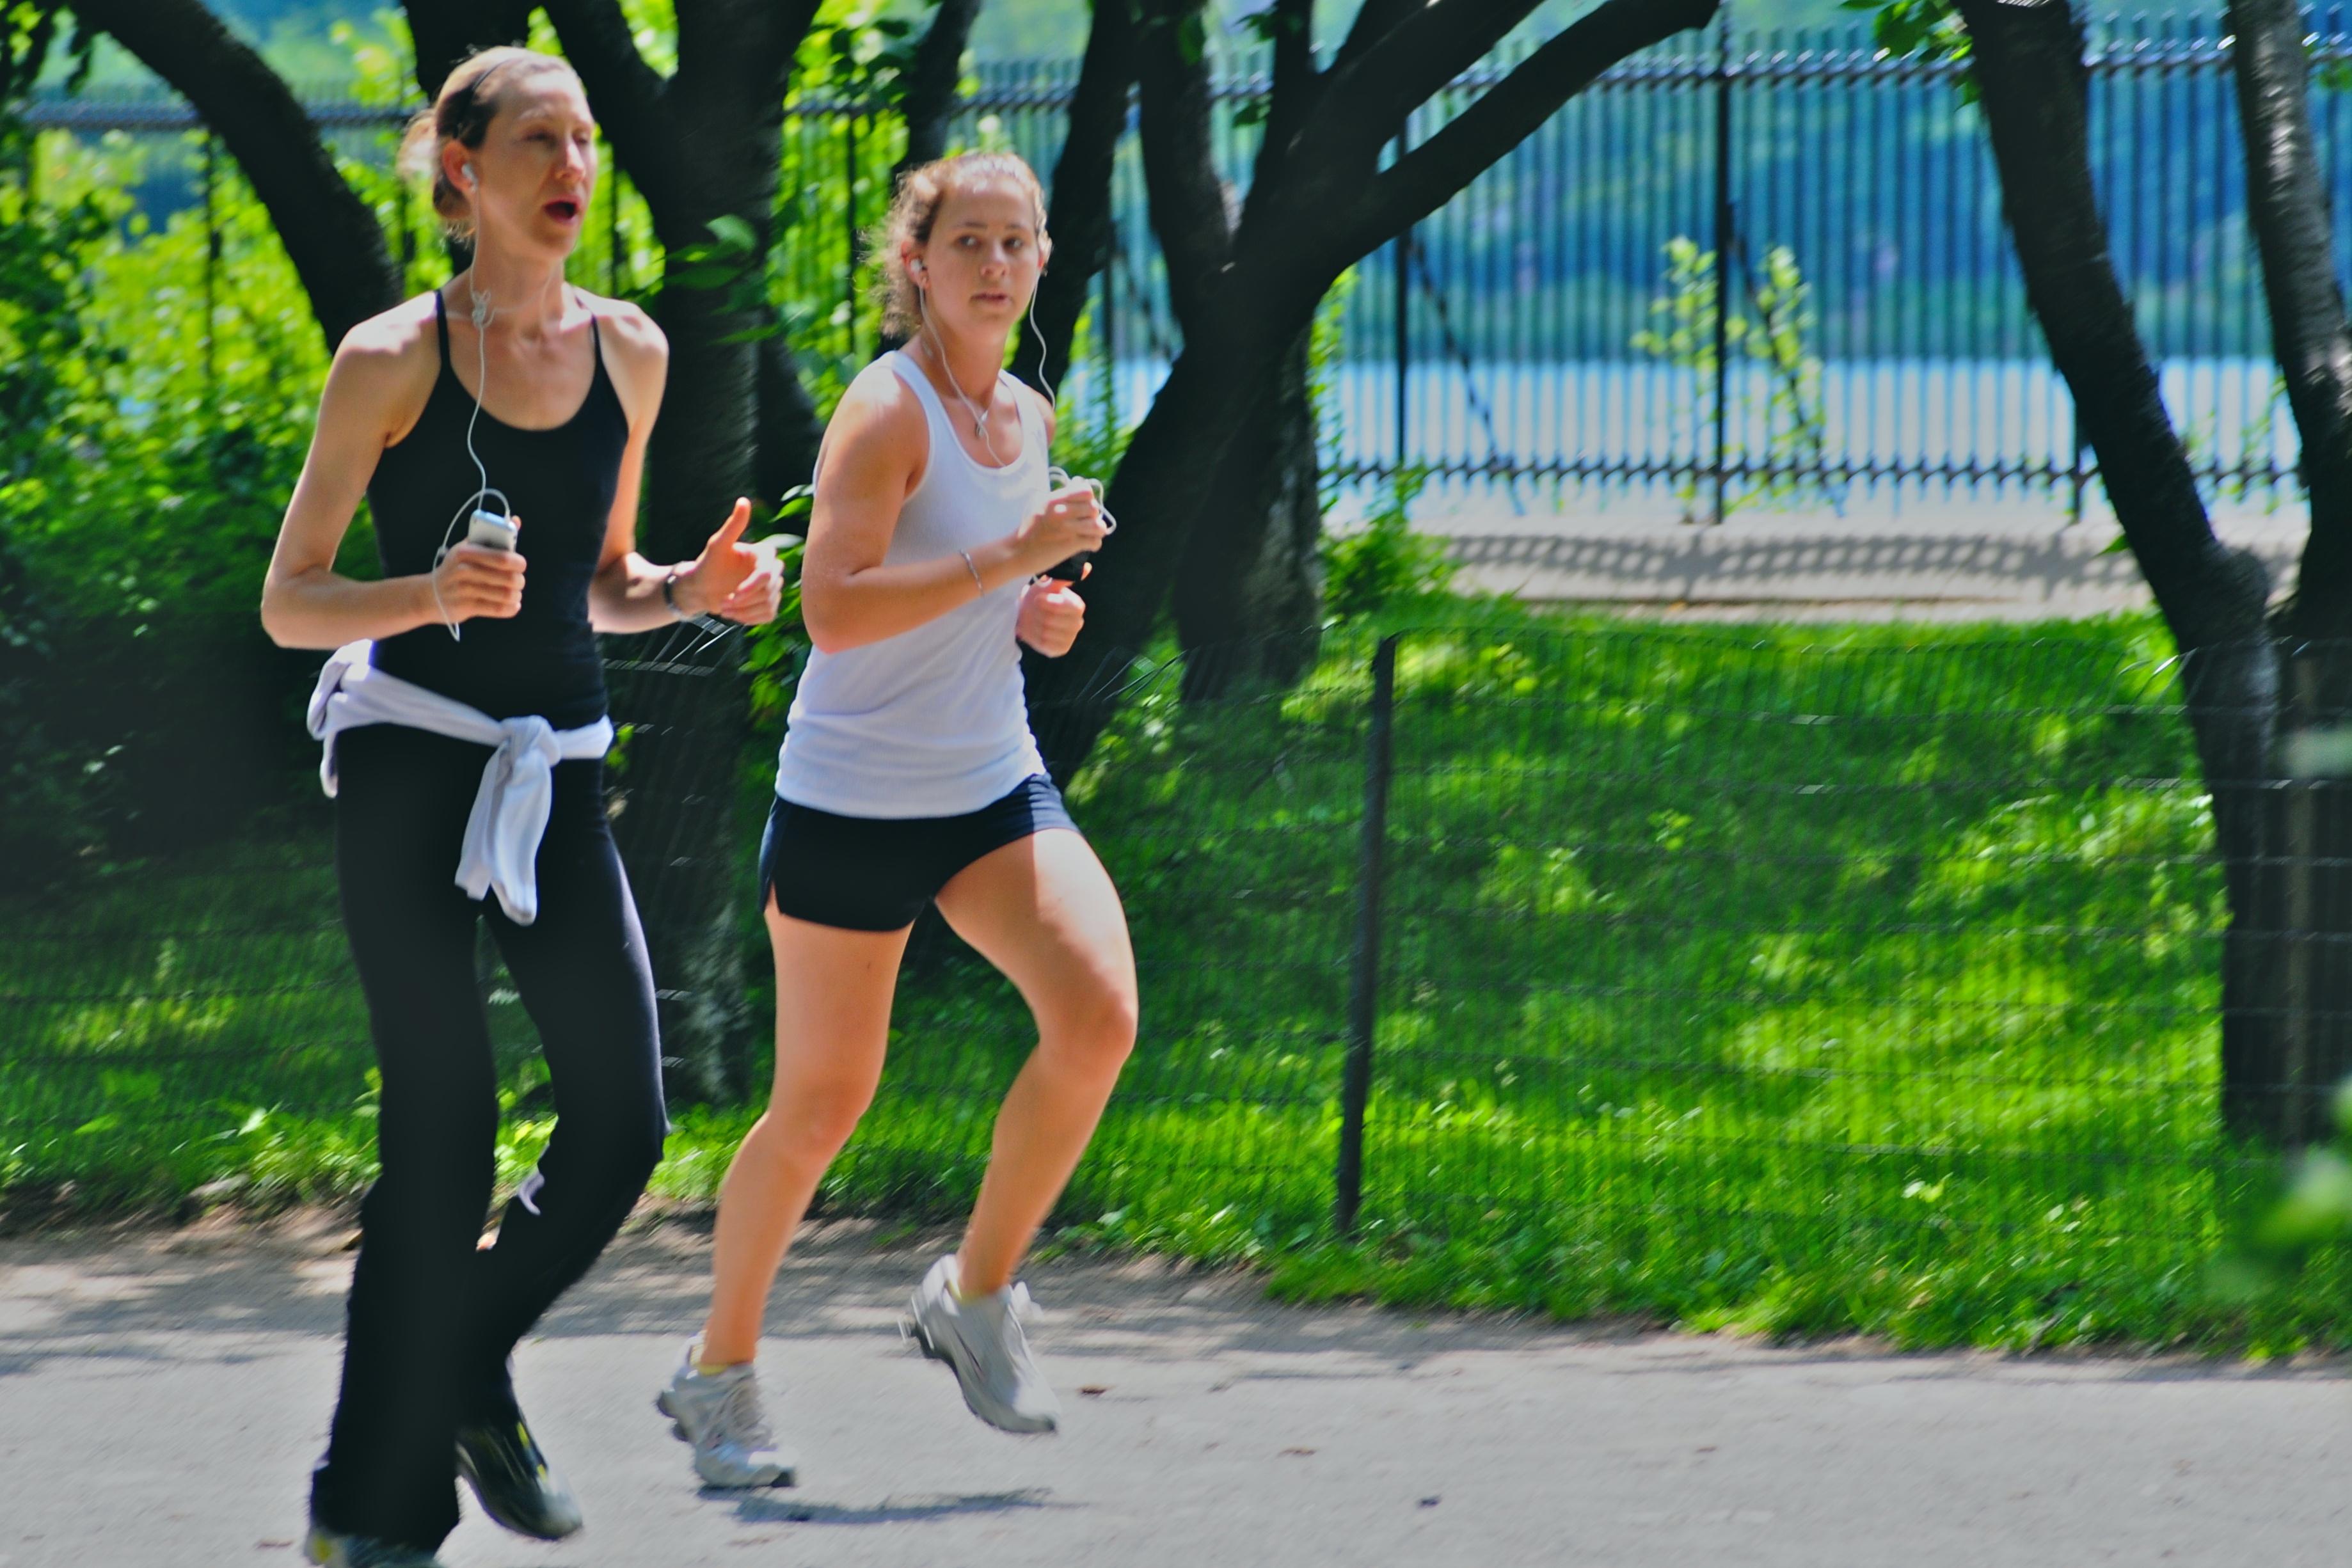 Jogging-ladies-at-day